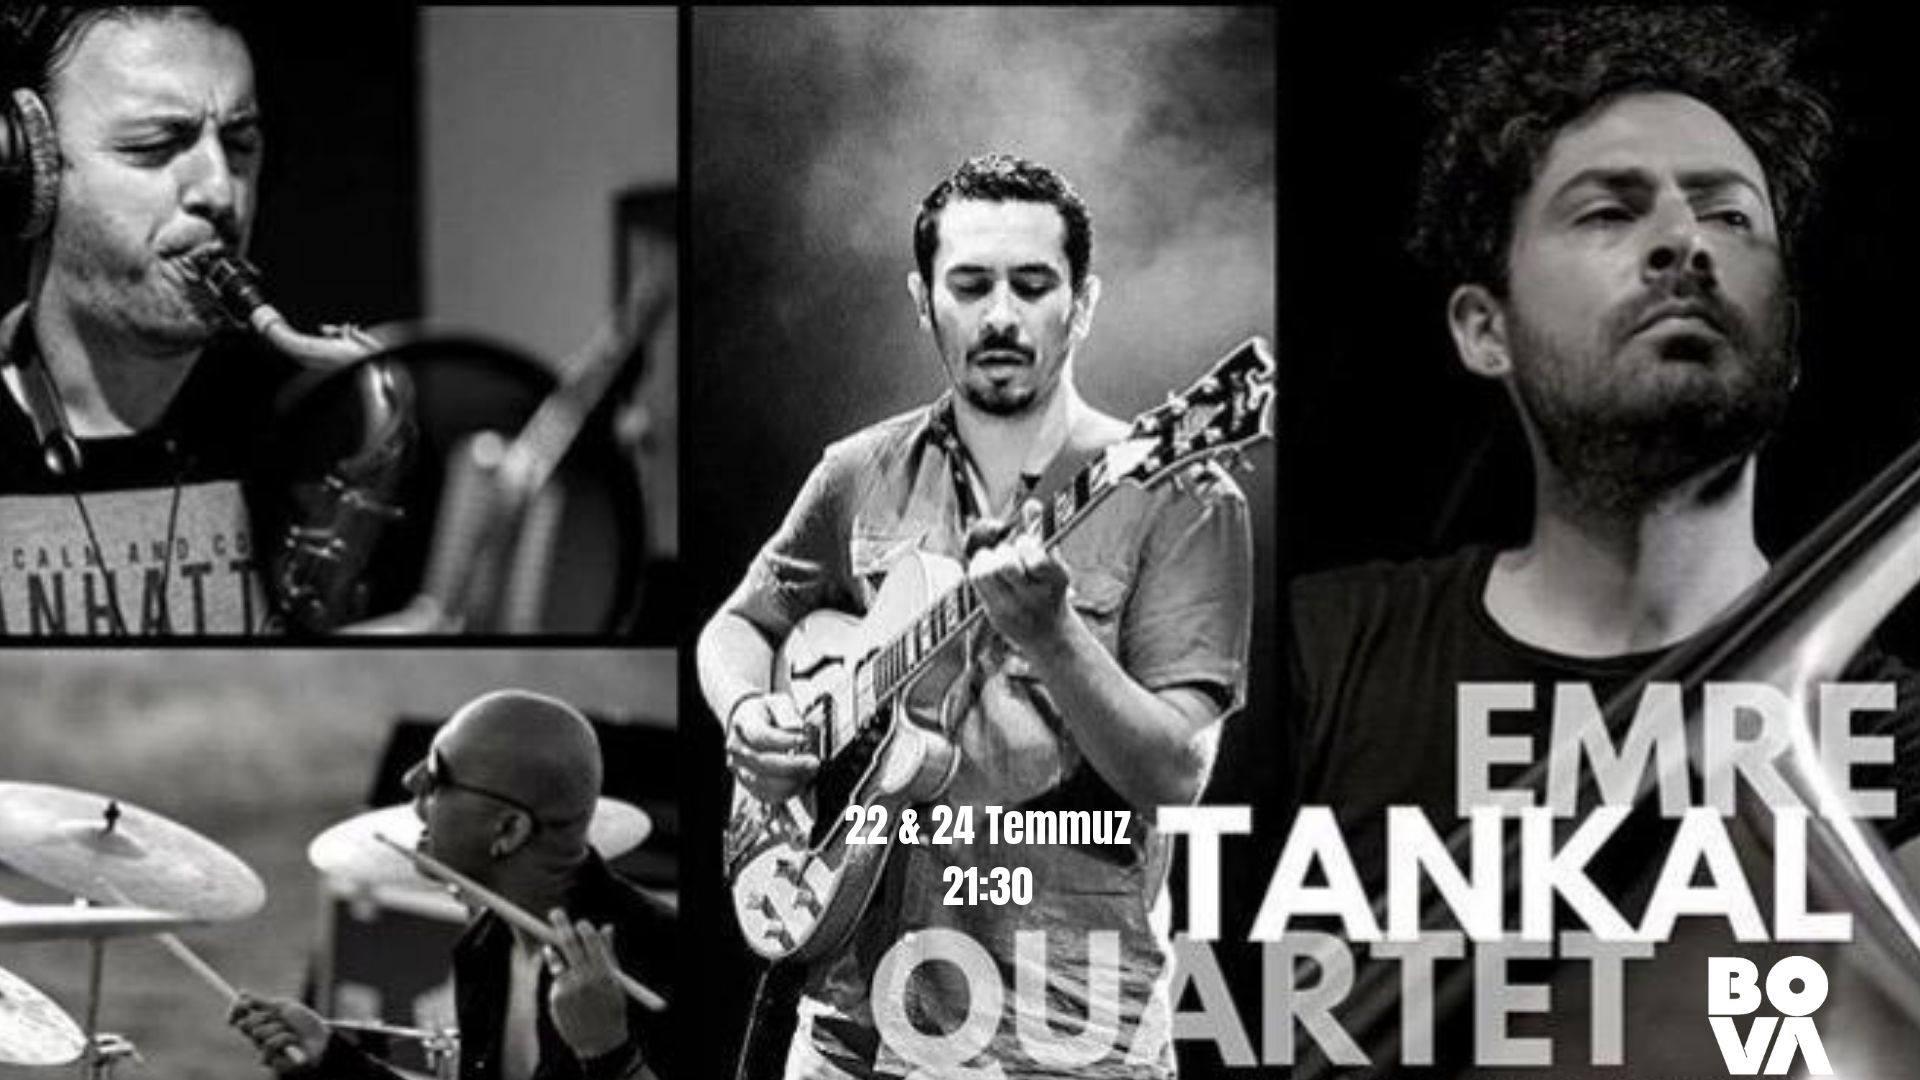 Emre Tankal Quartet